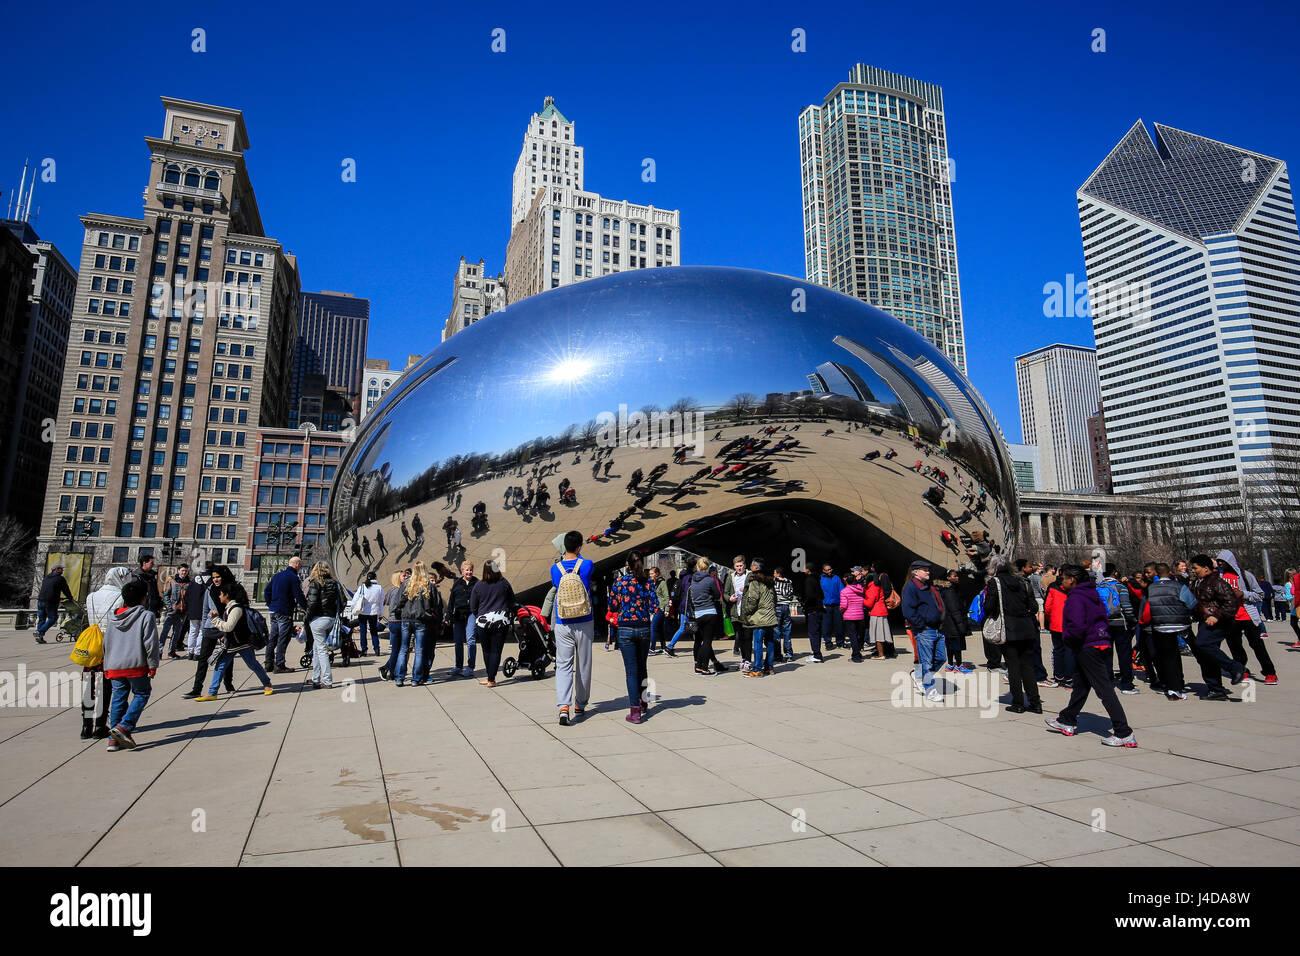 Tourists visit the sculpture Cloud Gate, the Bean, Millennium Park, City skyline, Chicago, Illinois, USA, North - Stock Image